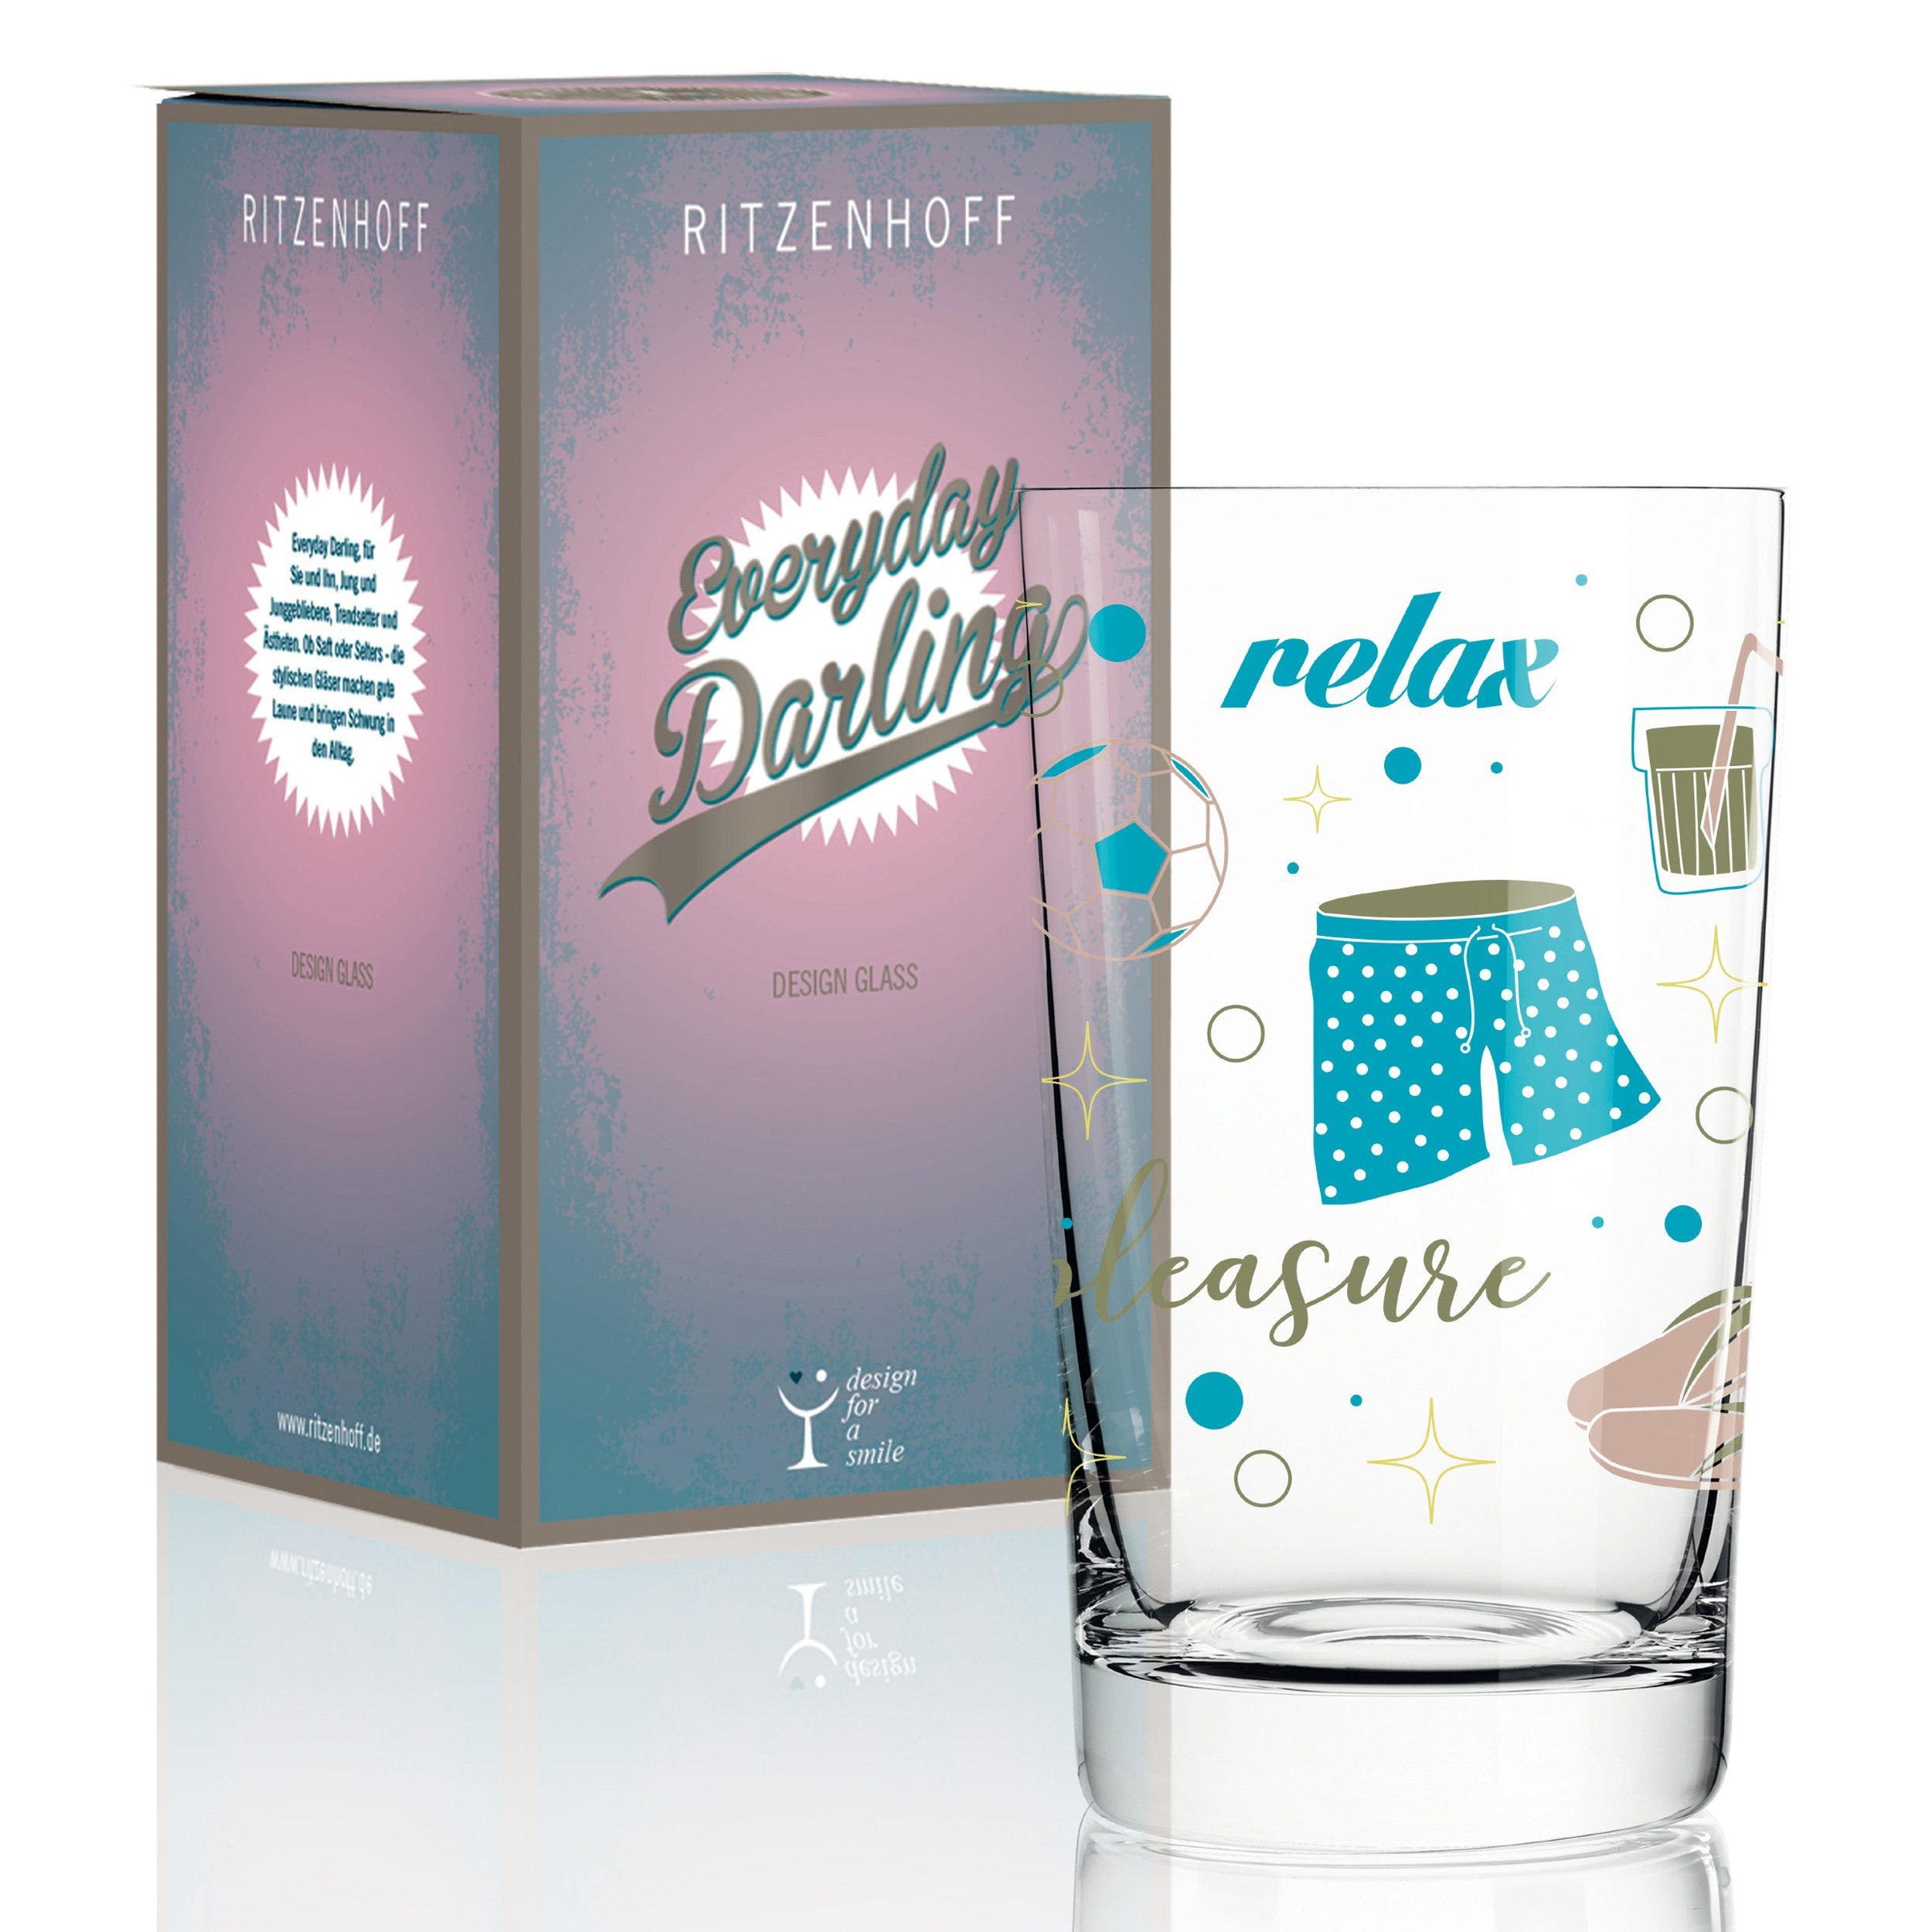 Ritzenhoff Everyday Darling Soft Drink Glass by Liana Cavallaro 300 ml with Trendy Designs